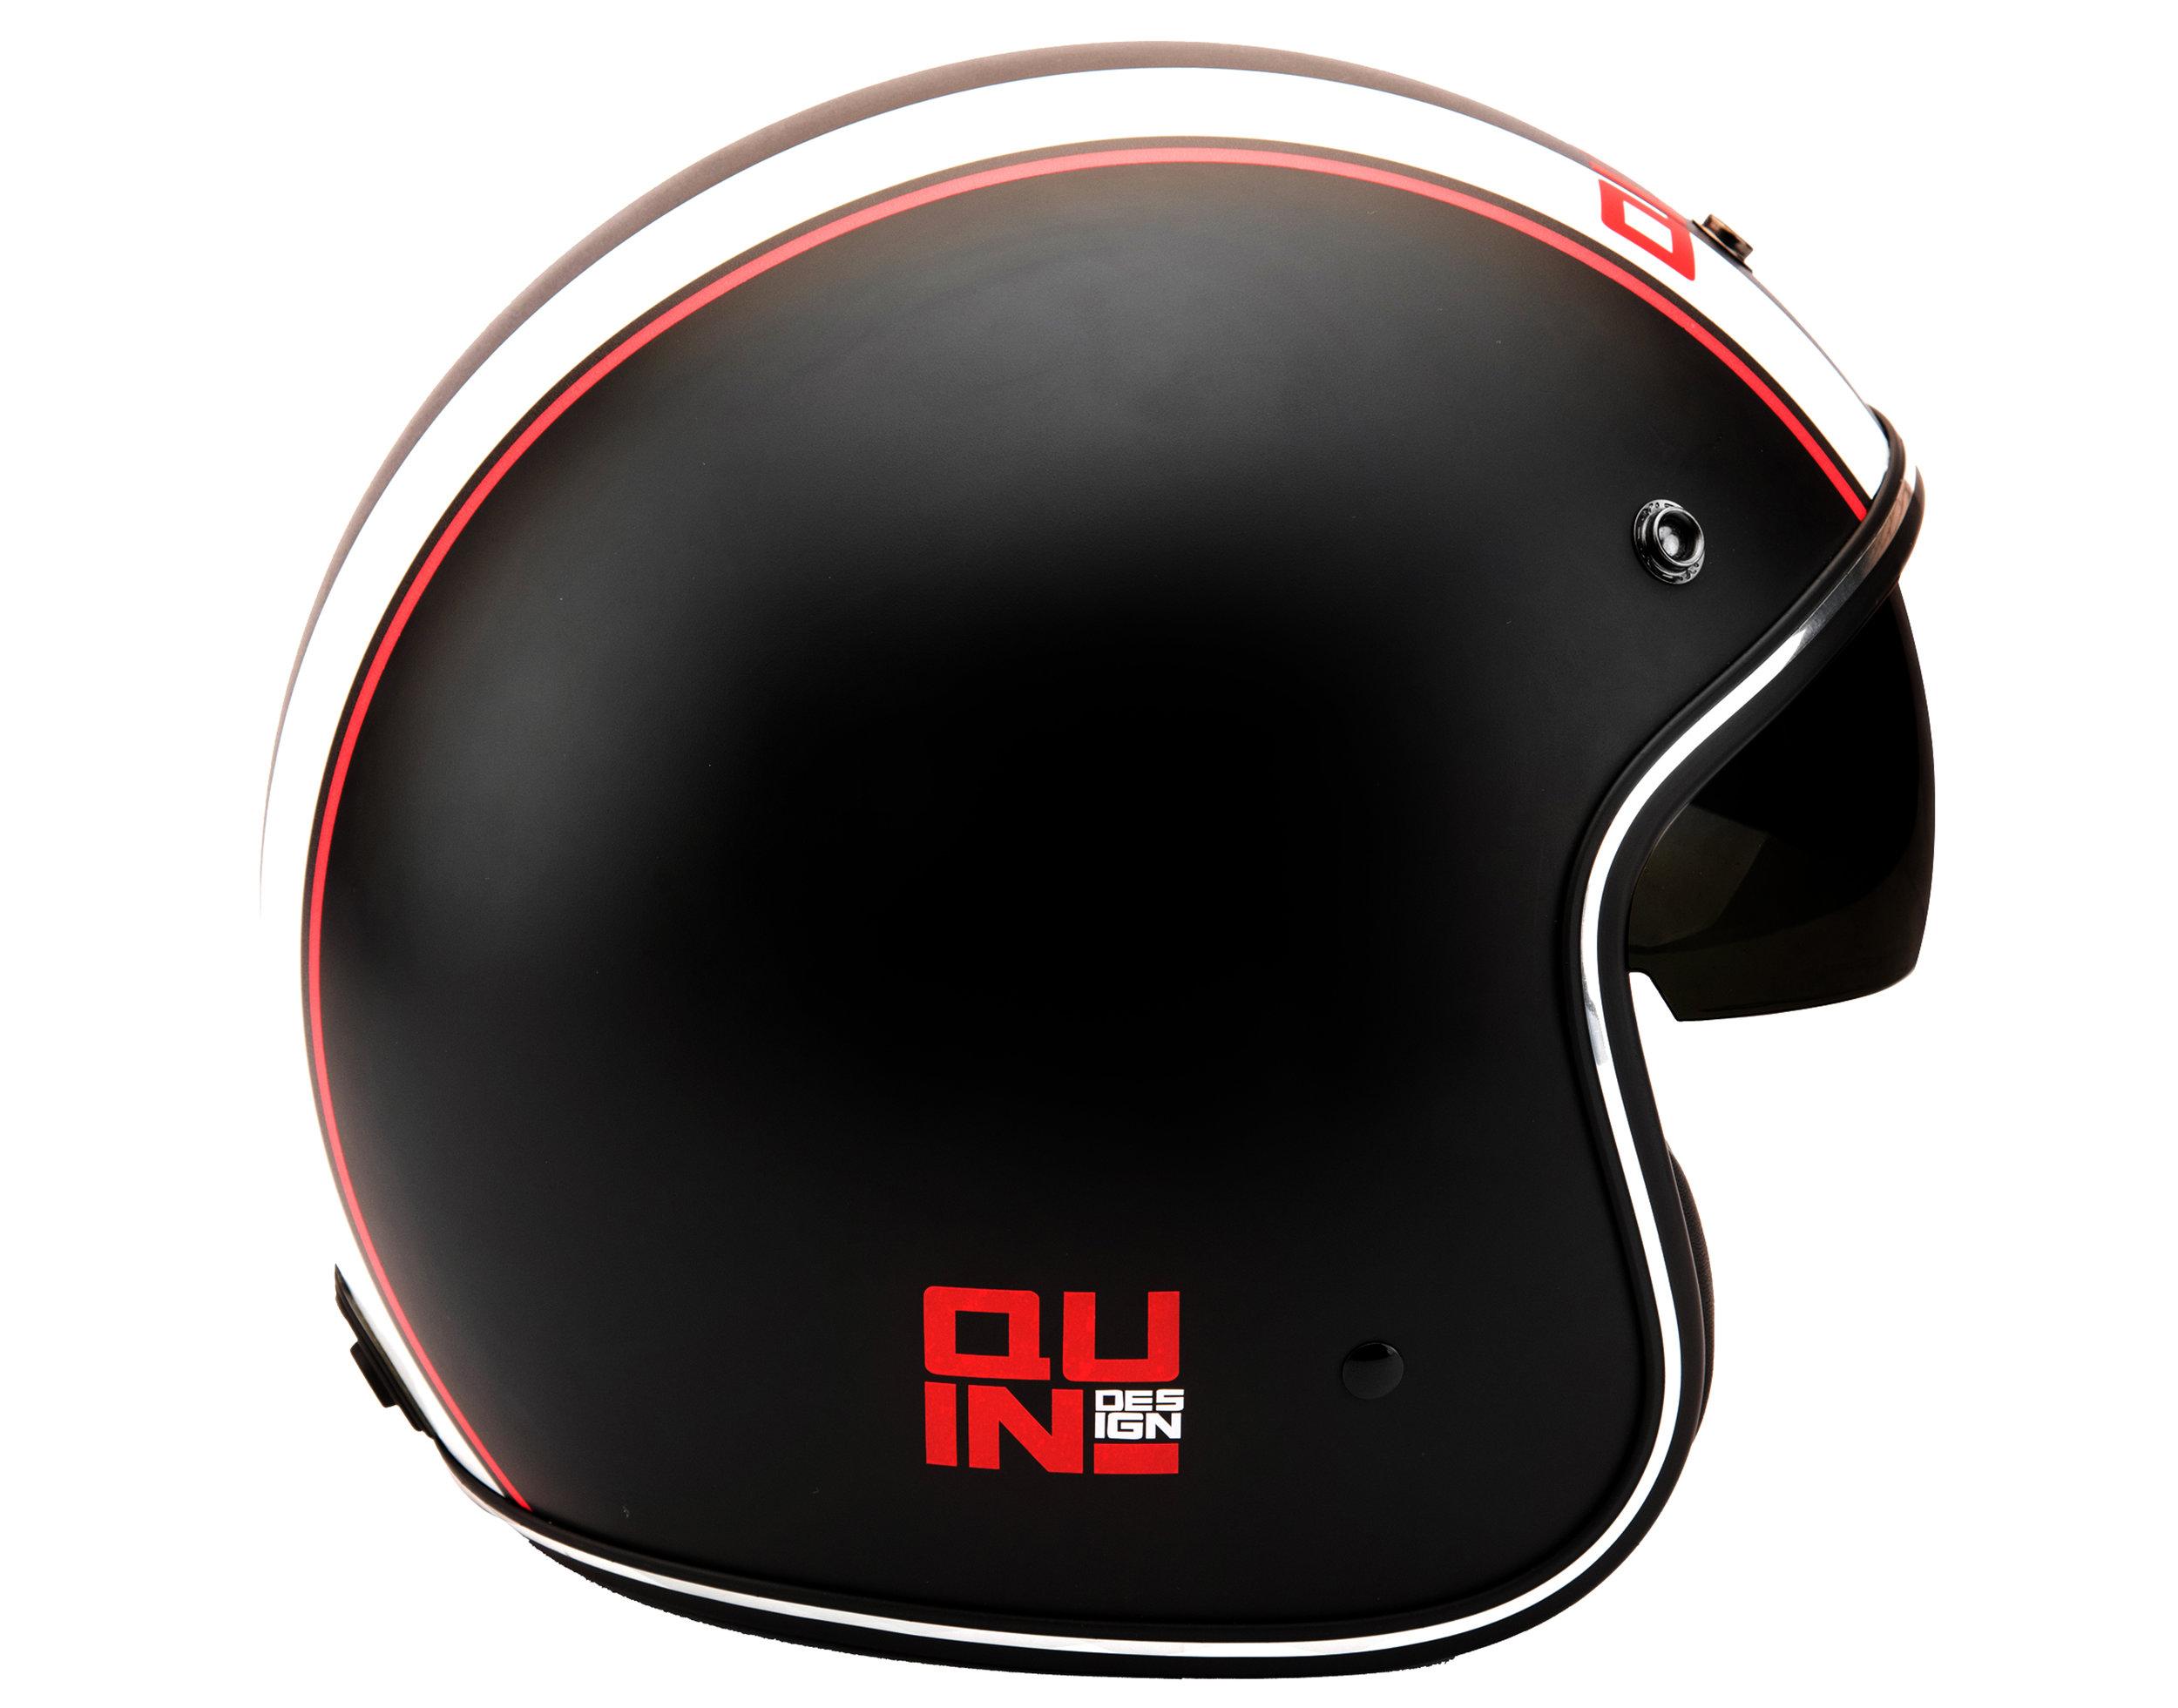 Quin Helmet open face red.jpg